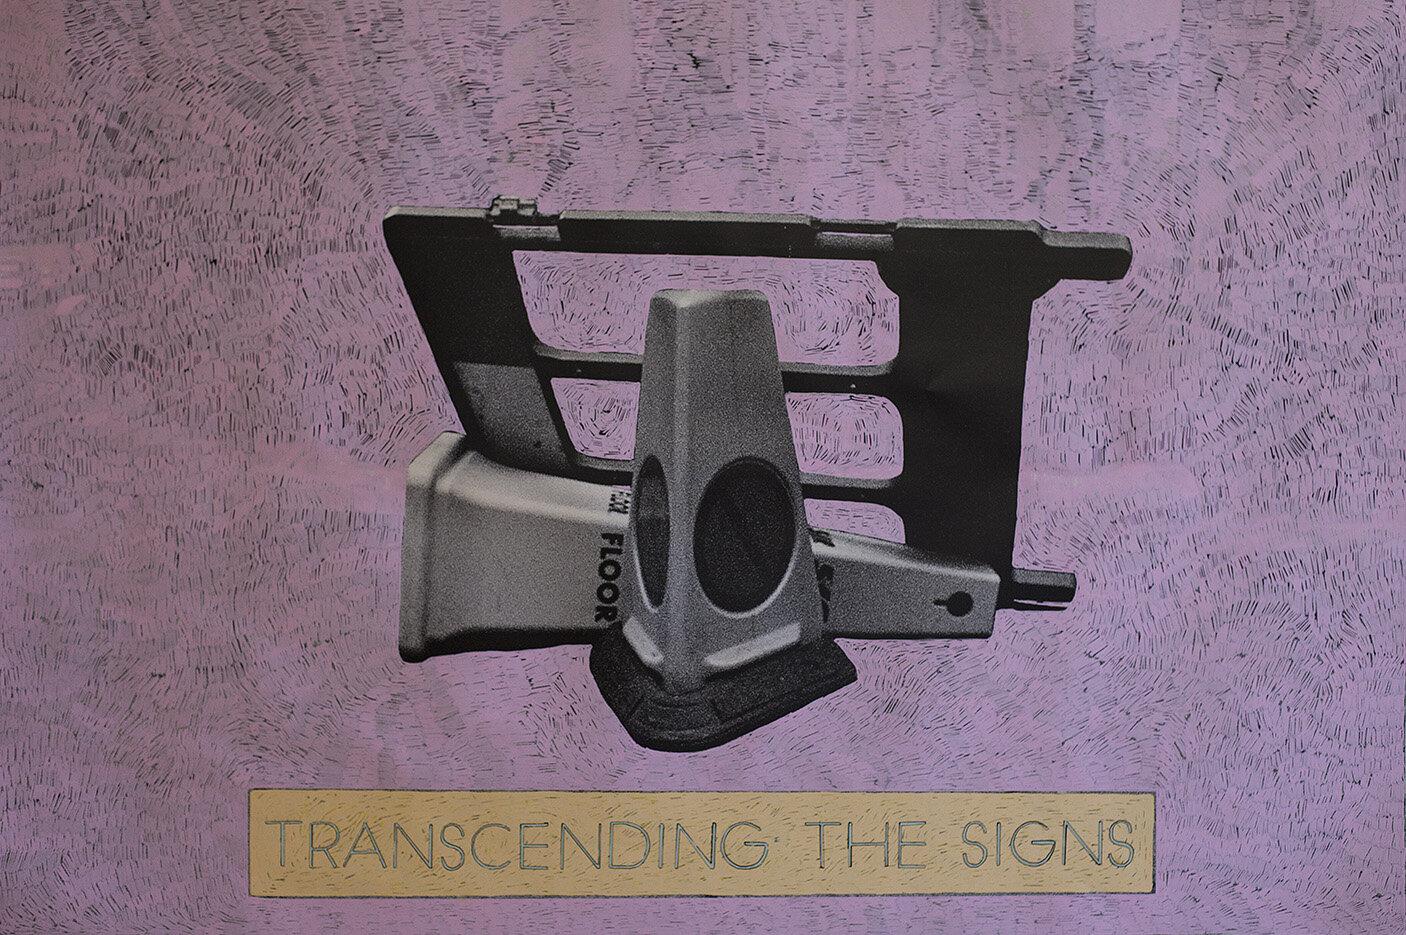 'Transcending the Signs' 2017, Inkjet photograph & Acrylic, 150x101cm